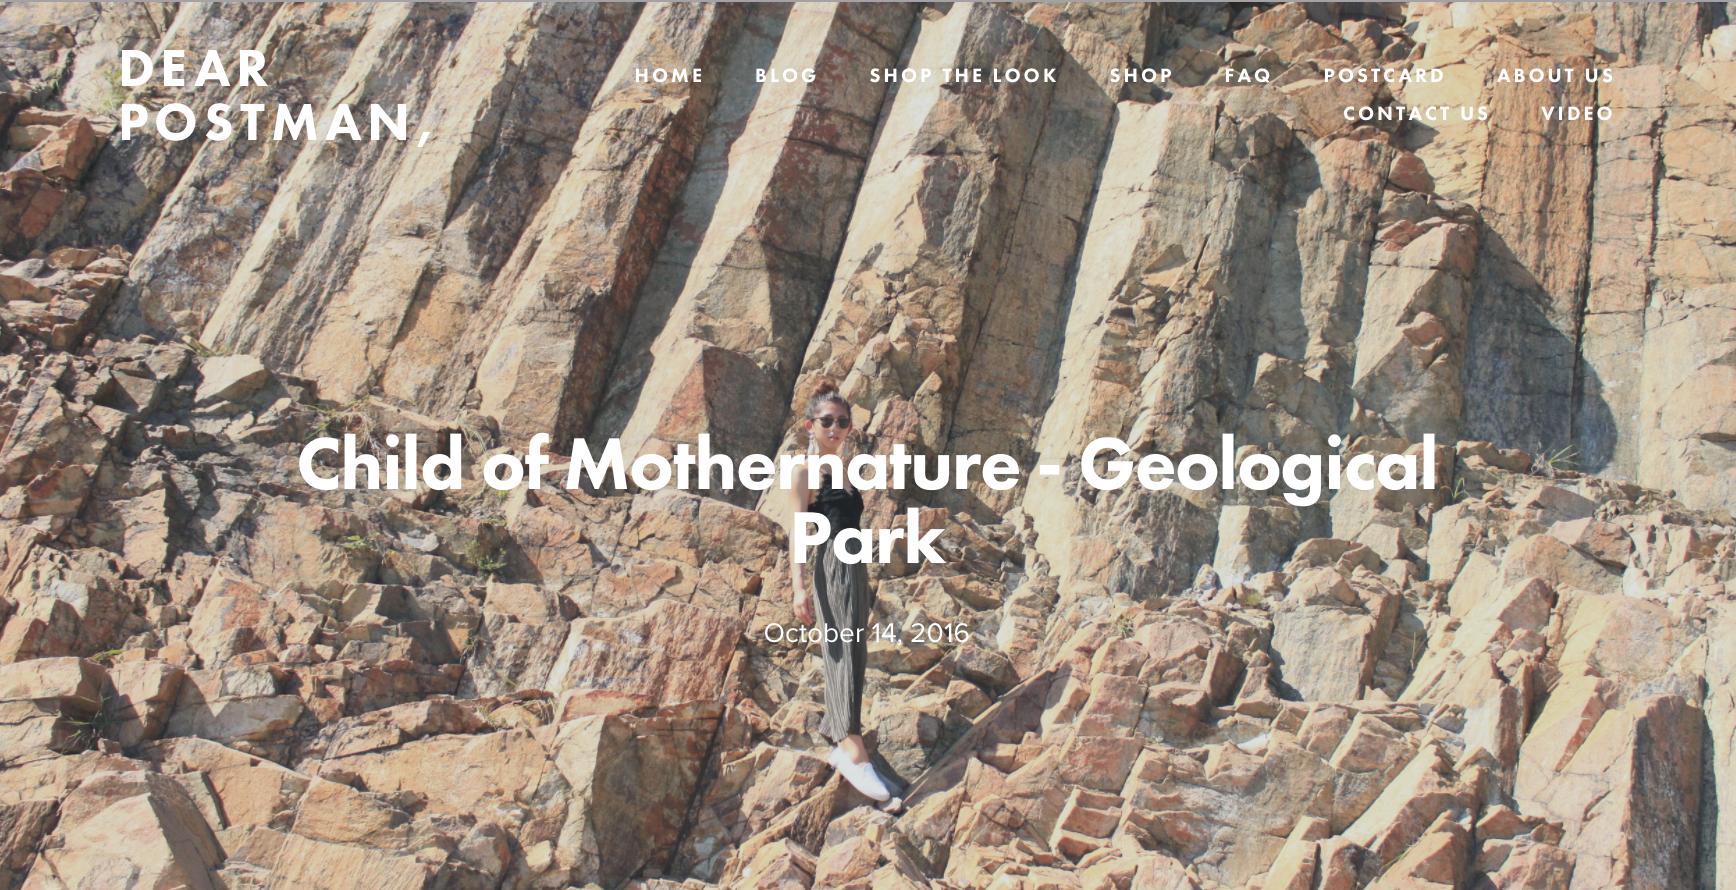 Child of Mothernature - Geological Park